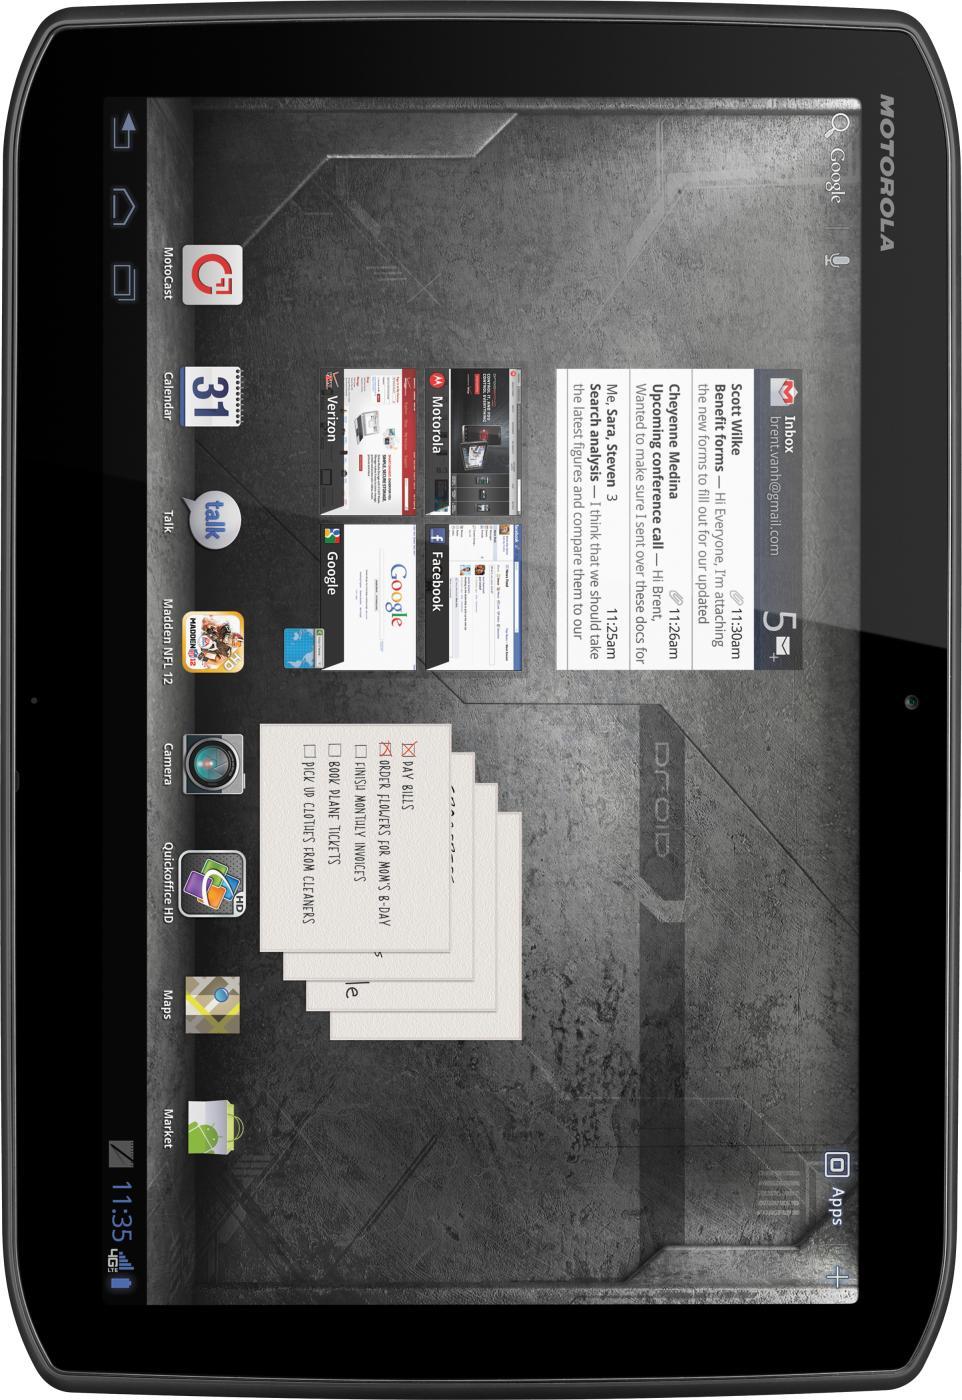 Motorola DROID XYBOARD 10.1 MZ617 32GB